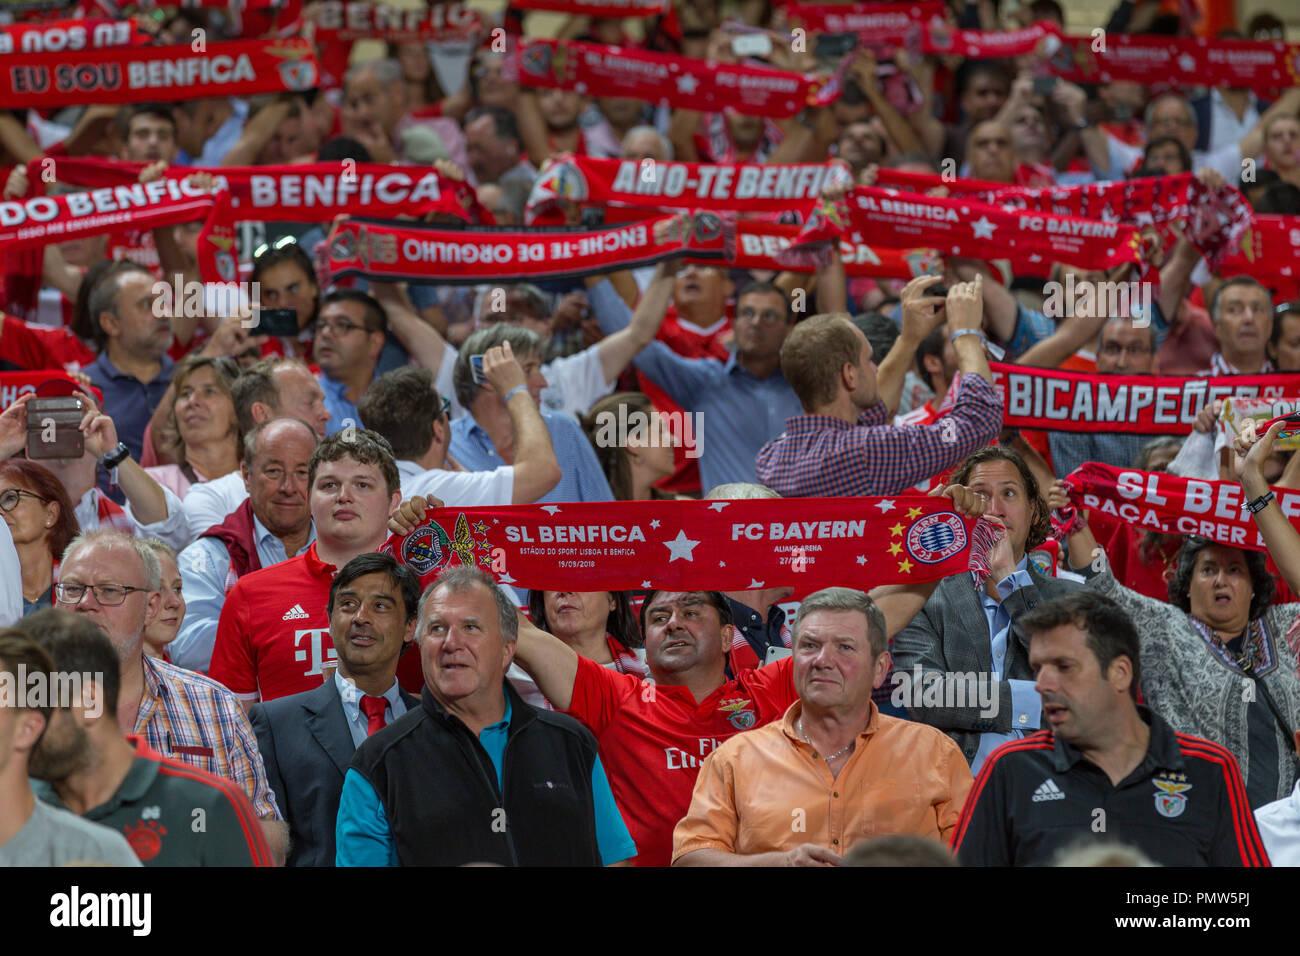 Fussball Club Bayern Munchen Stock Photos Fussball Club